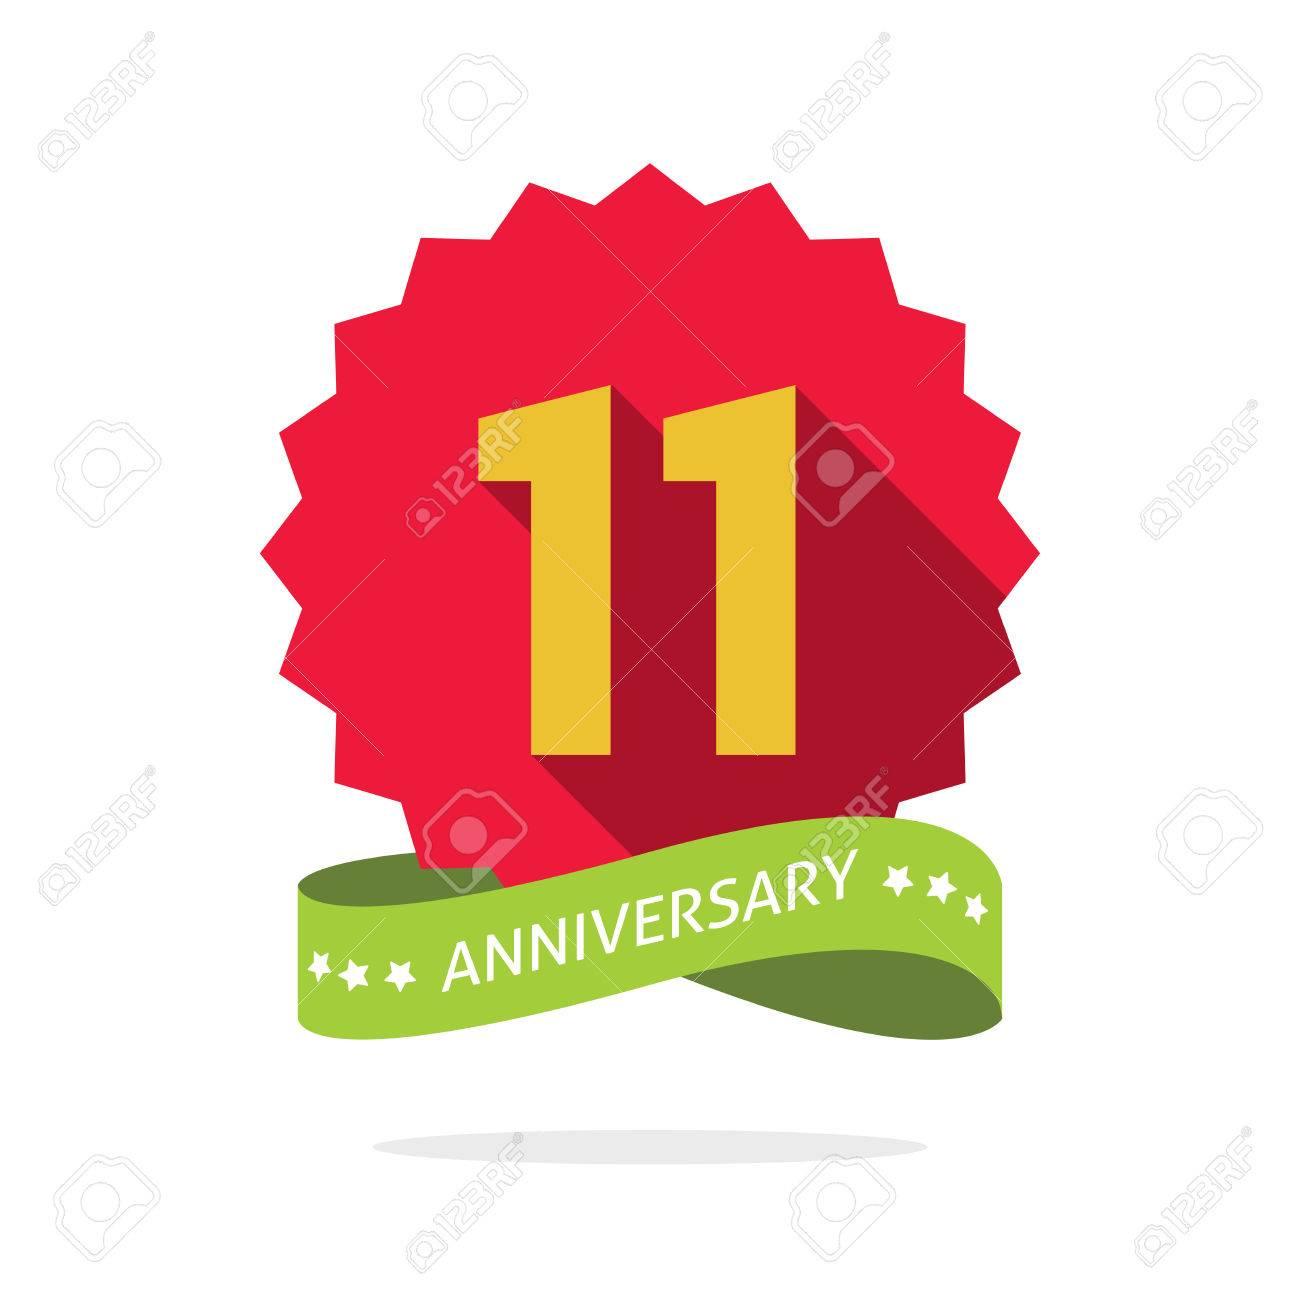 11 Anniversario Di Matrimonio.Vettoriale 11 Anniversario Badge Con Ombra Su Rosso Starburst